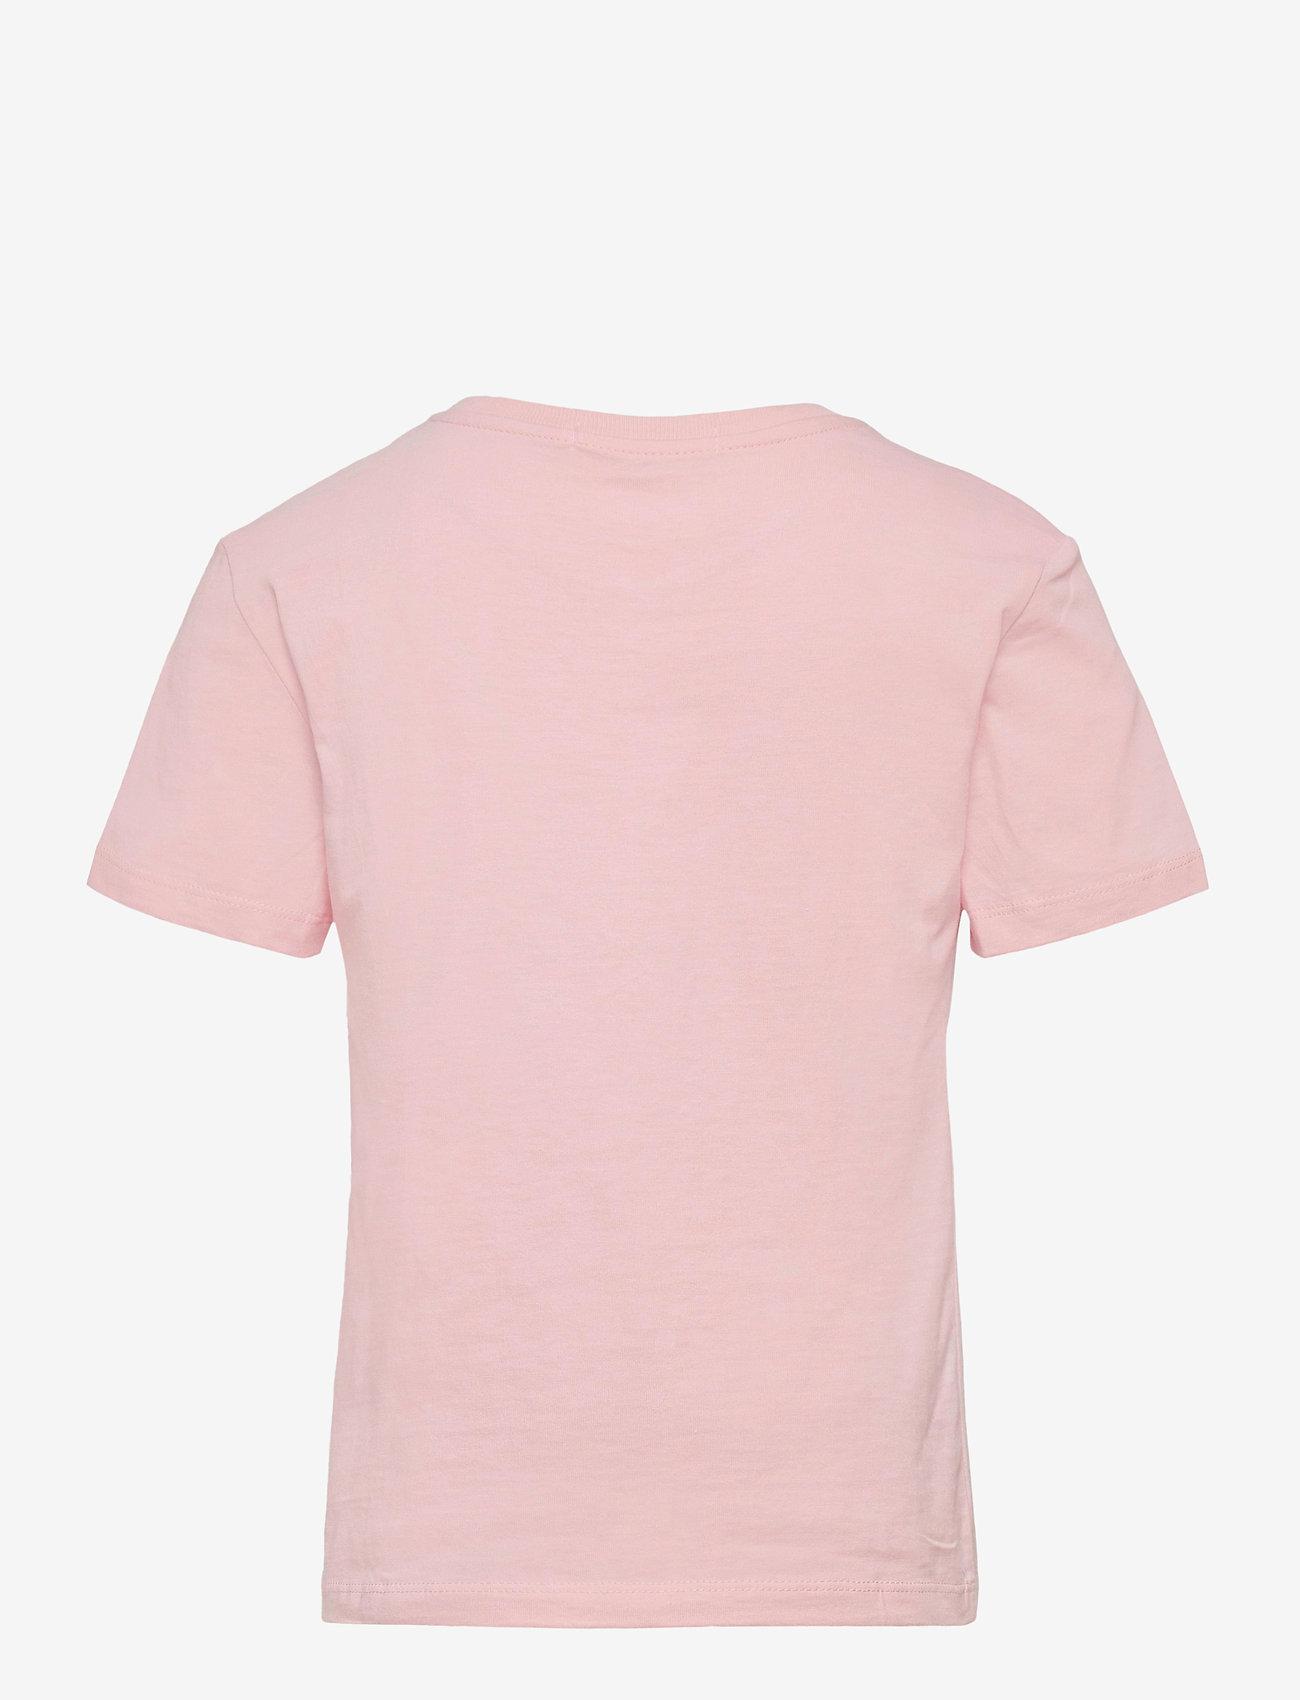 Calvin Klein - MONOGRAM LOGO T-SHIRT - t-shirts - sand rose - 1